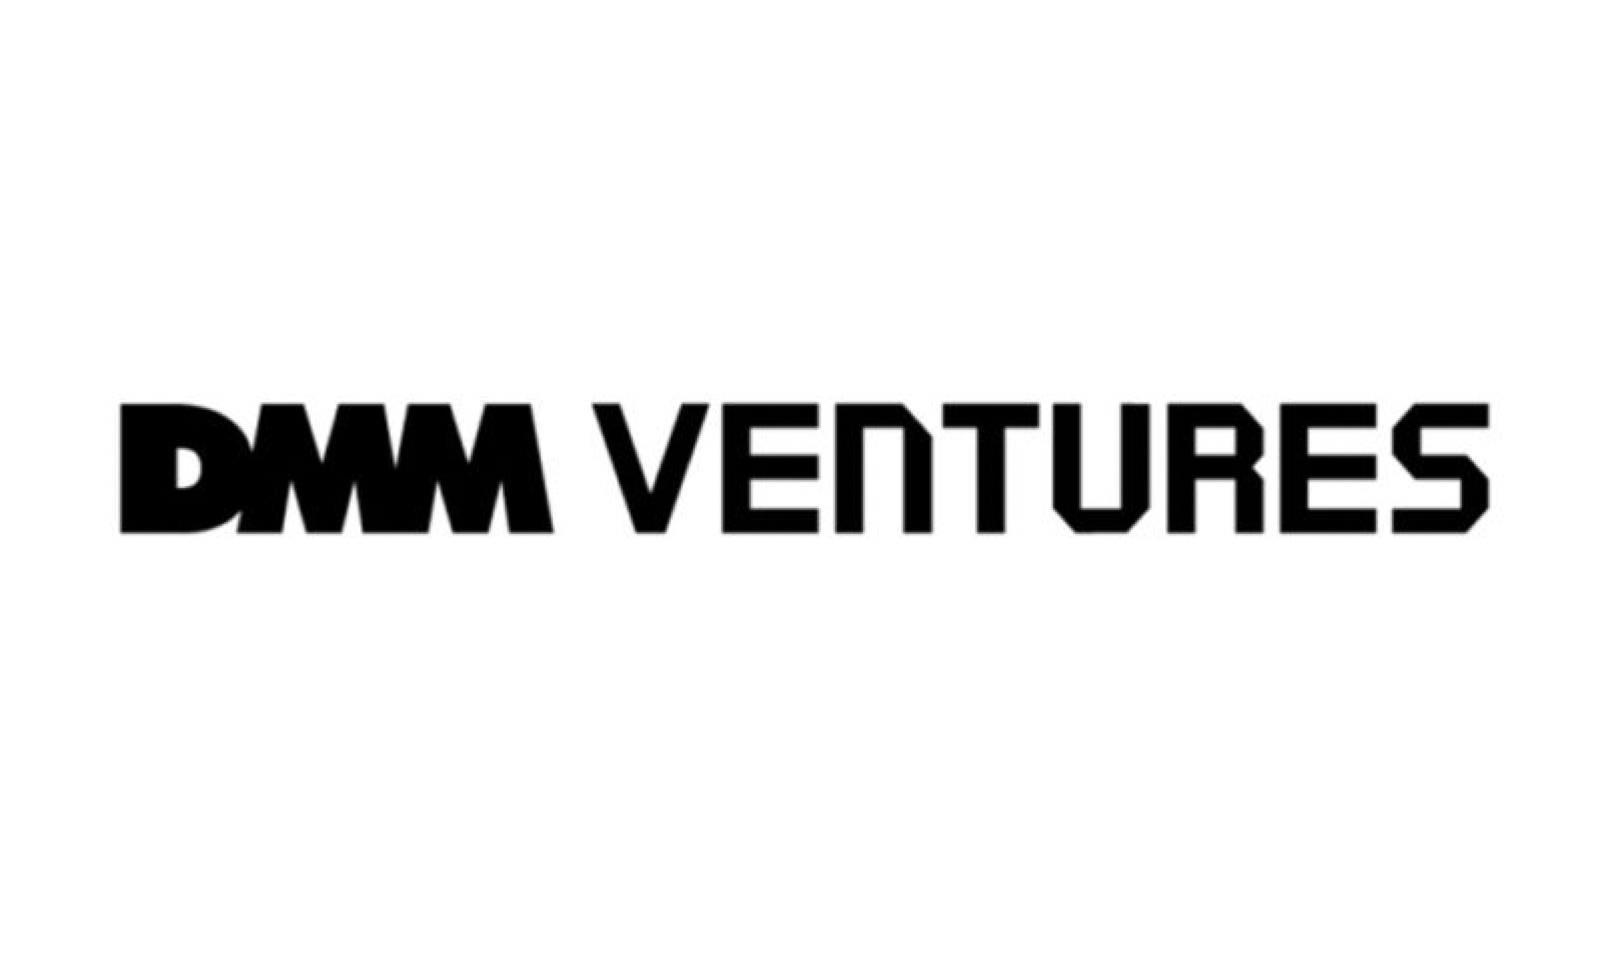 DMM VENTURES | ココドル、Bisu, Inc.、ジャパンヘルスケアの3社への出資を決定